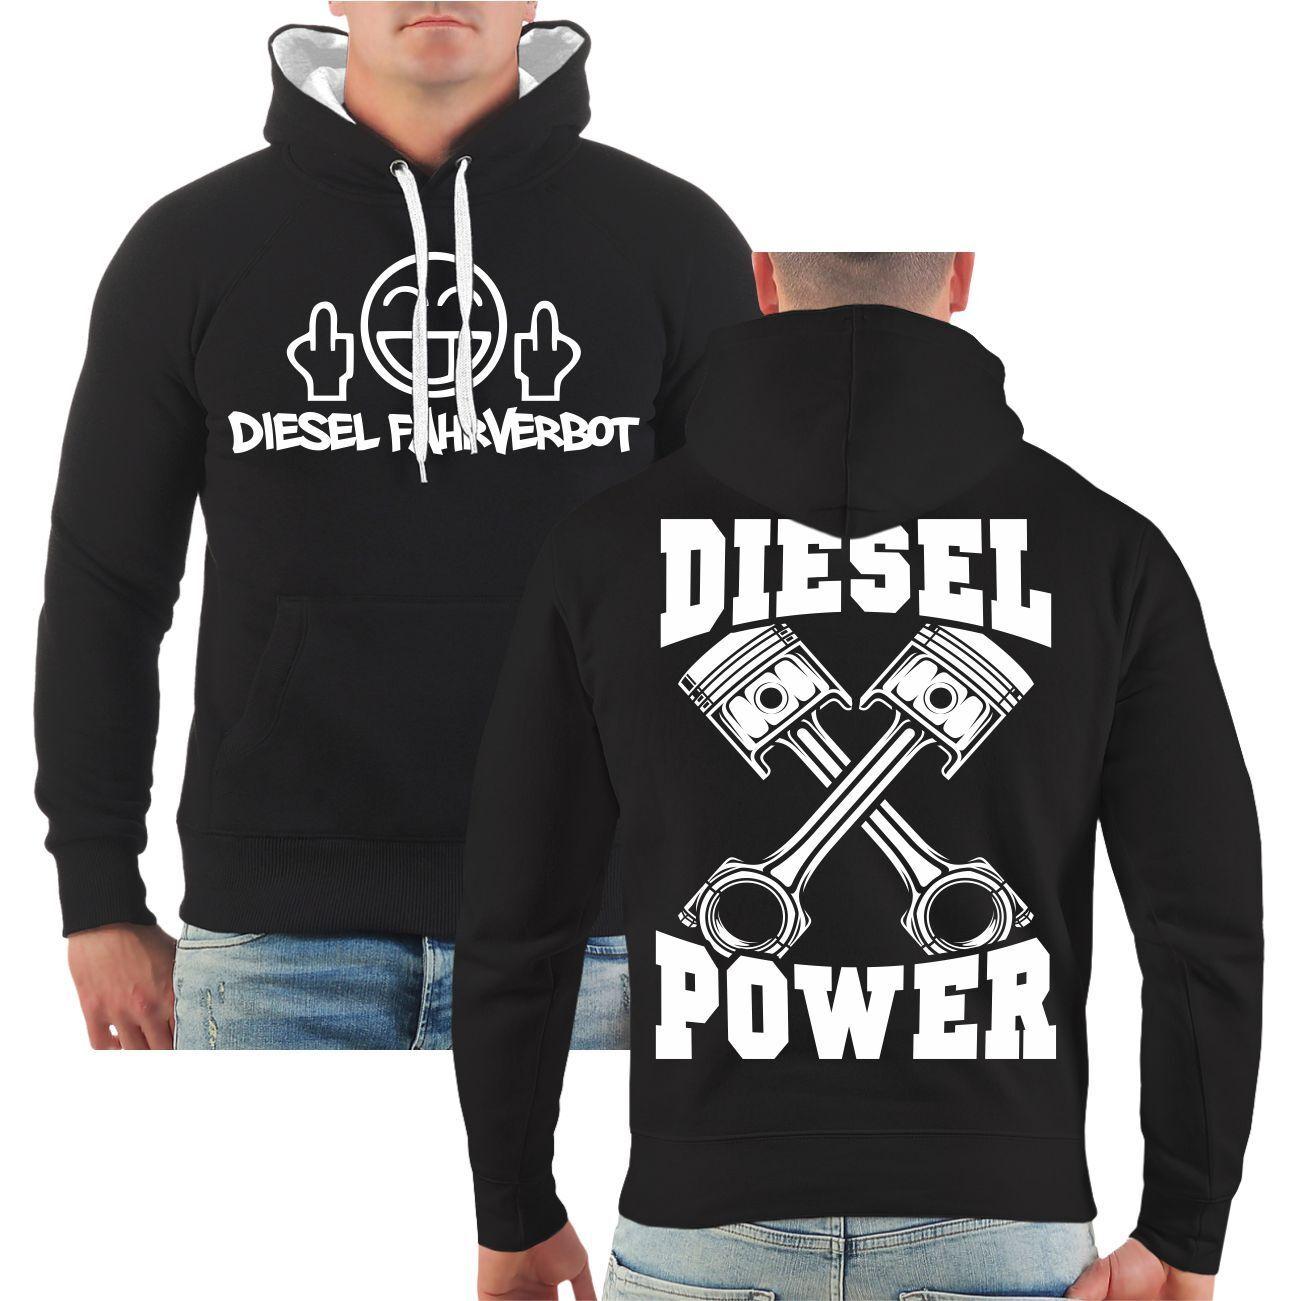 Kapuzenpullover Diesel Fahrverbot Power Auto Motiv Tuning Werkstatt Kfz Hoodie